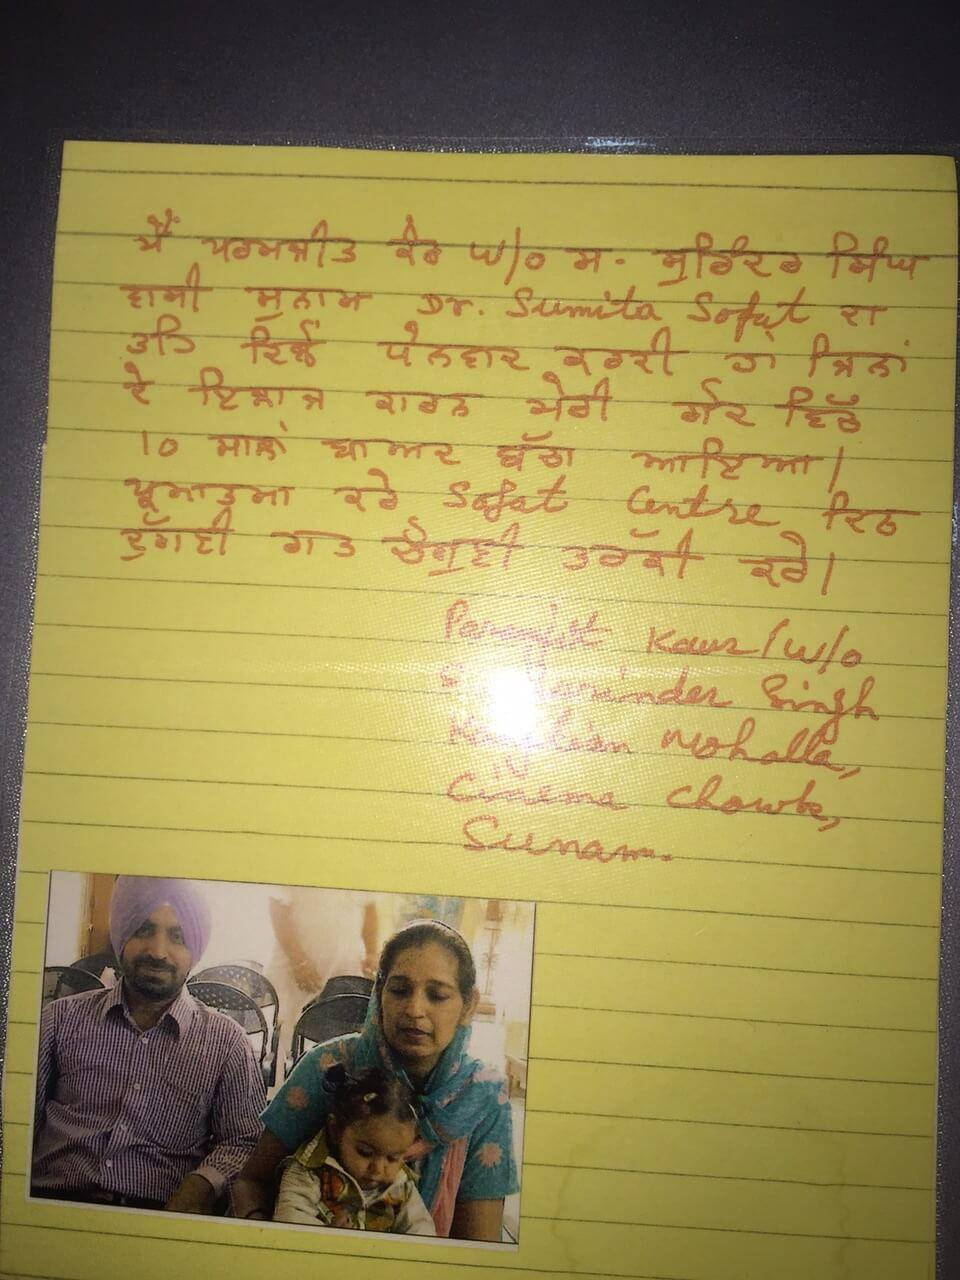 Surinder-Singh-Paramjit-Kaur